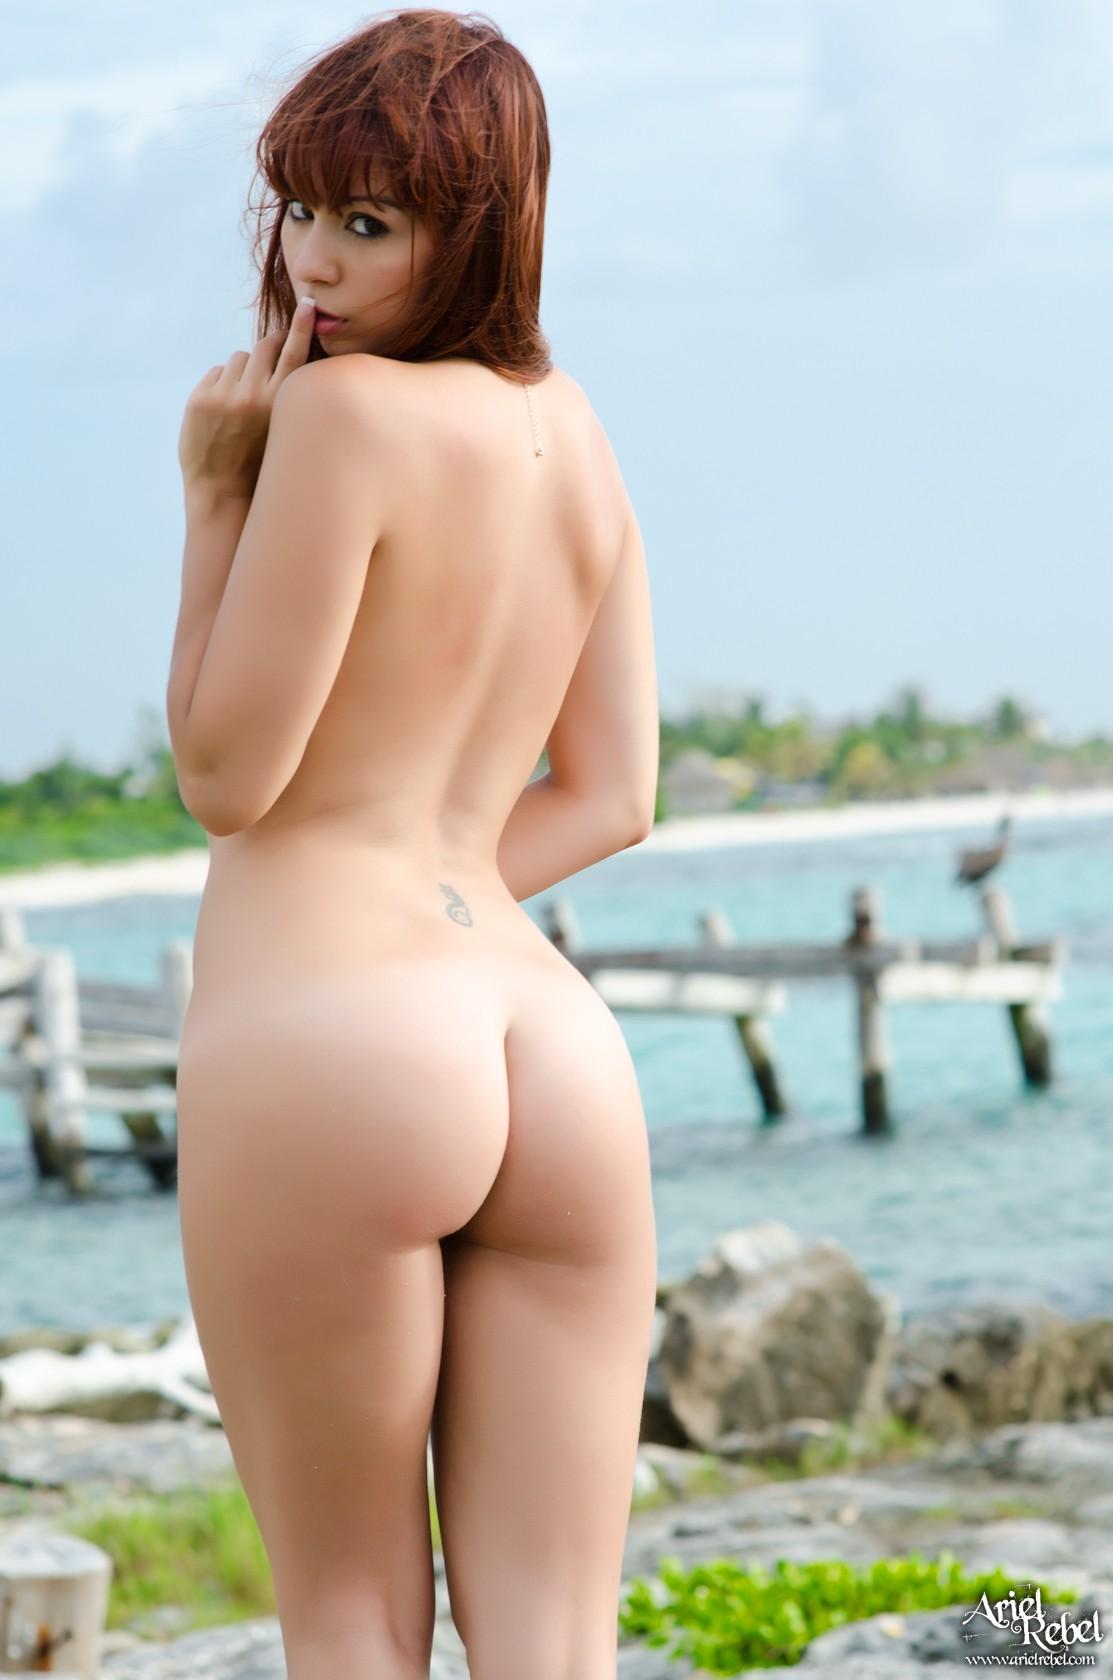 Ariel rebel beach for